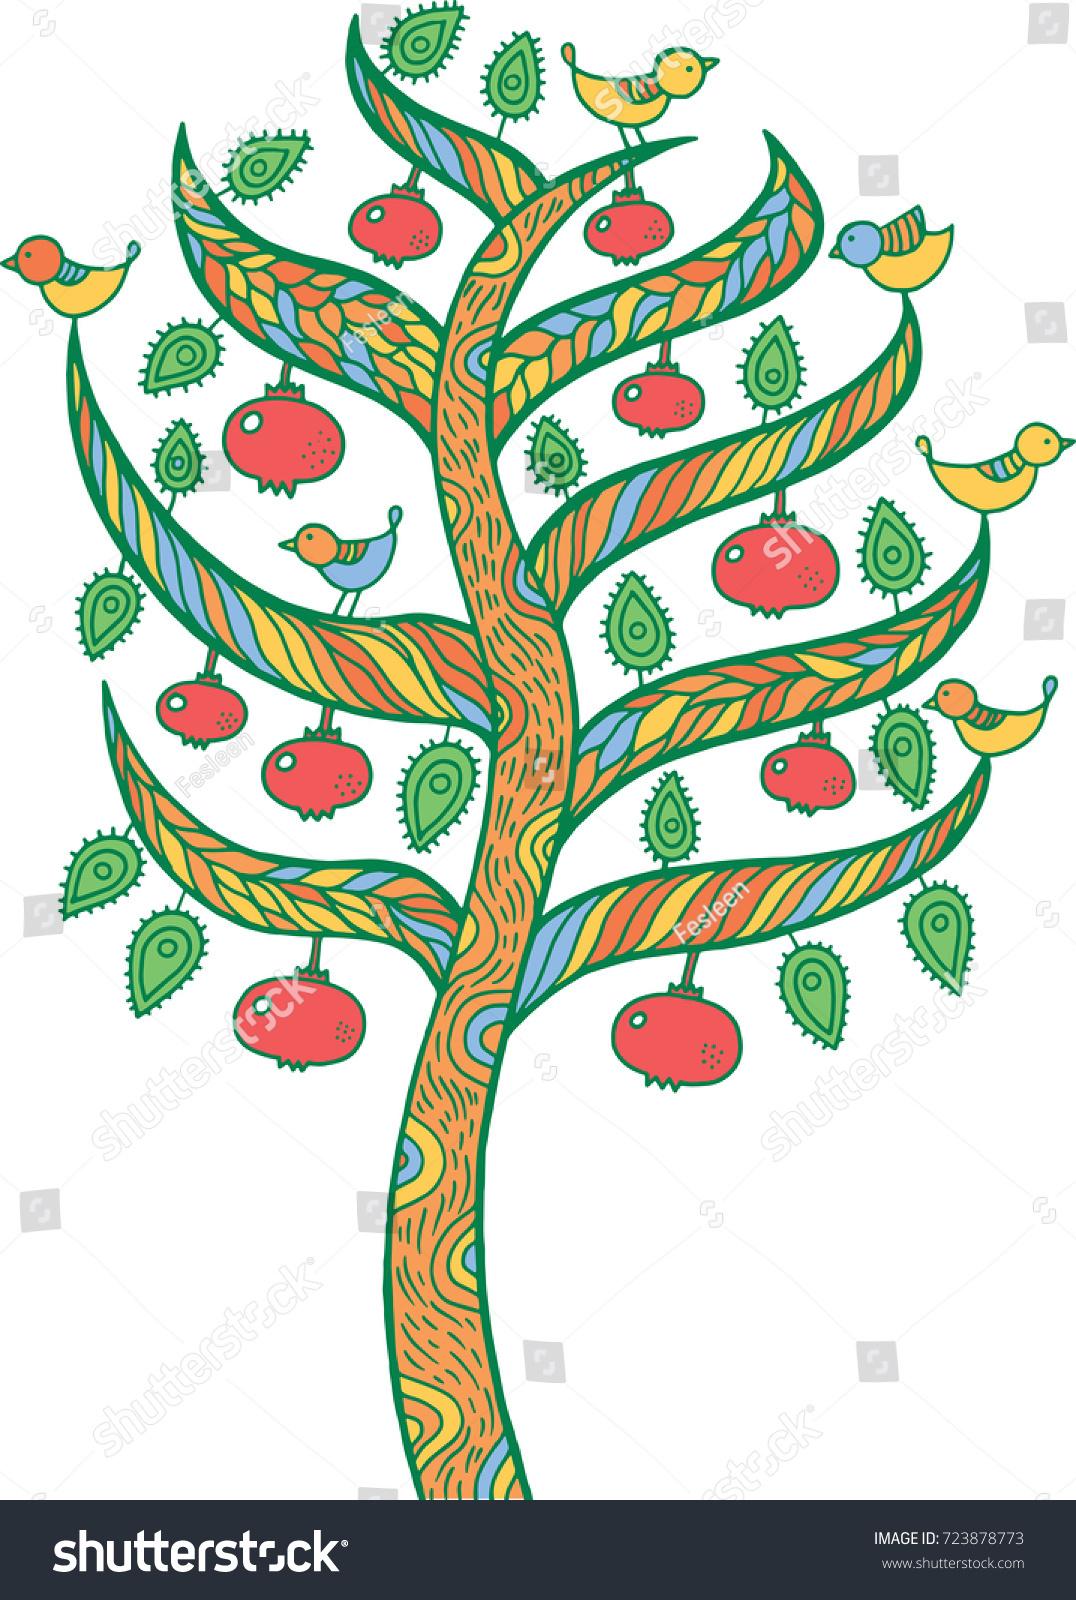 Pomegranate Tree Kids Illustration Colorful Doodle Stock ...